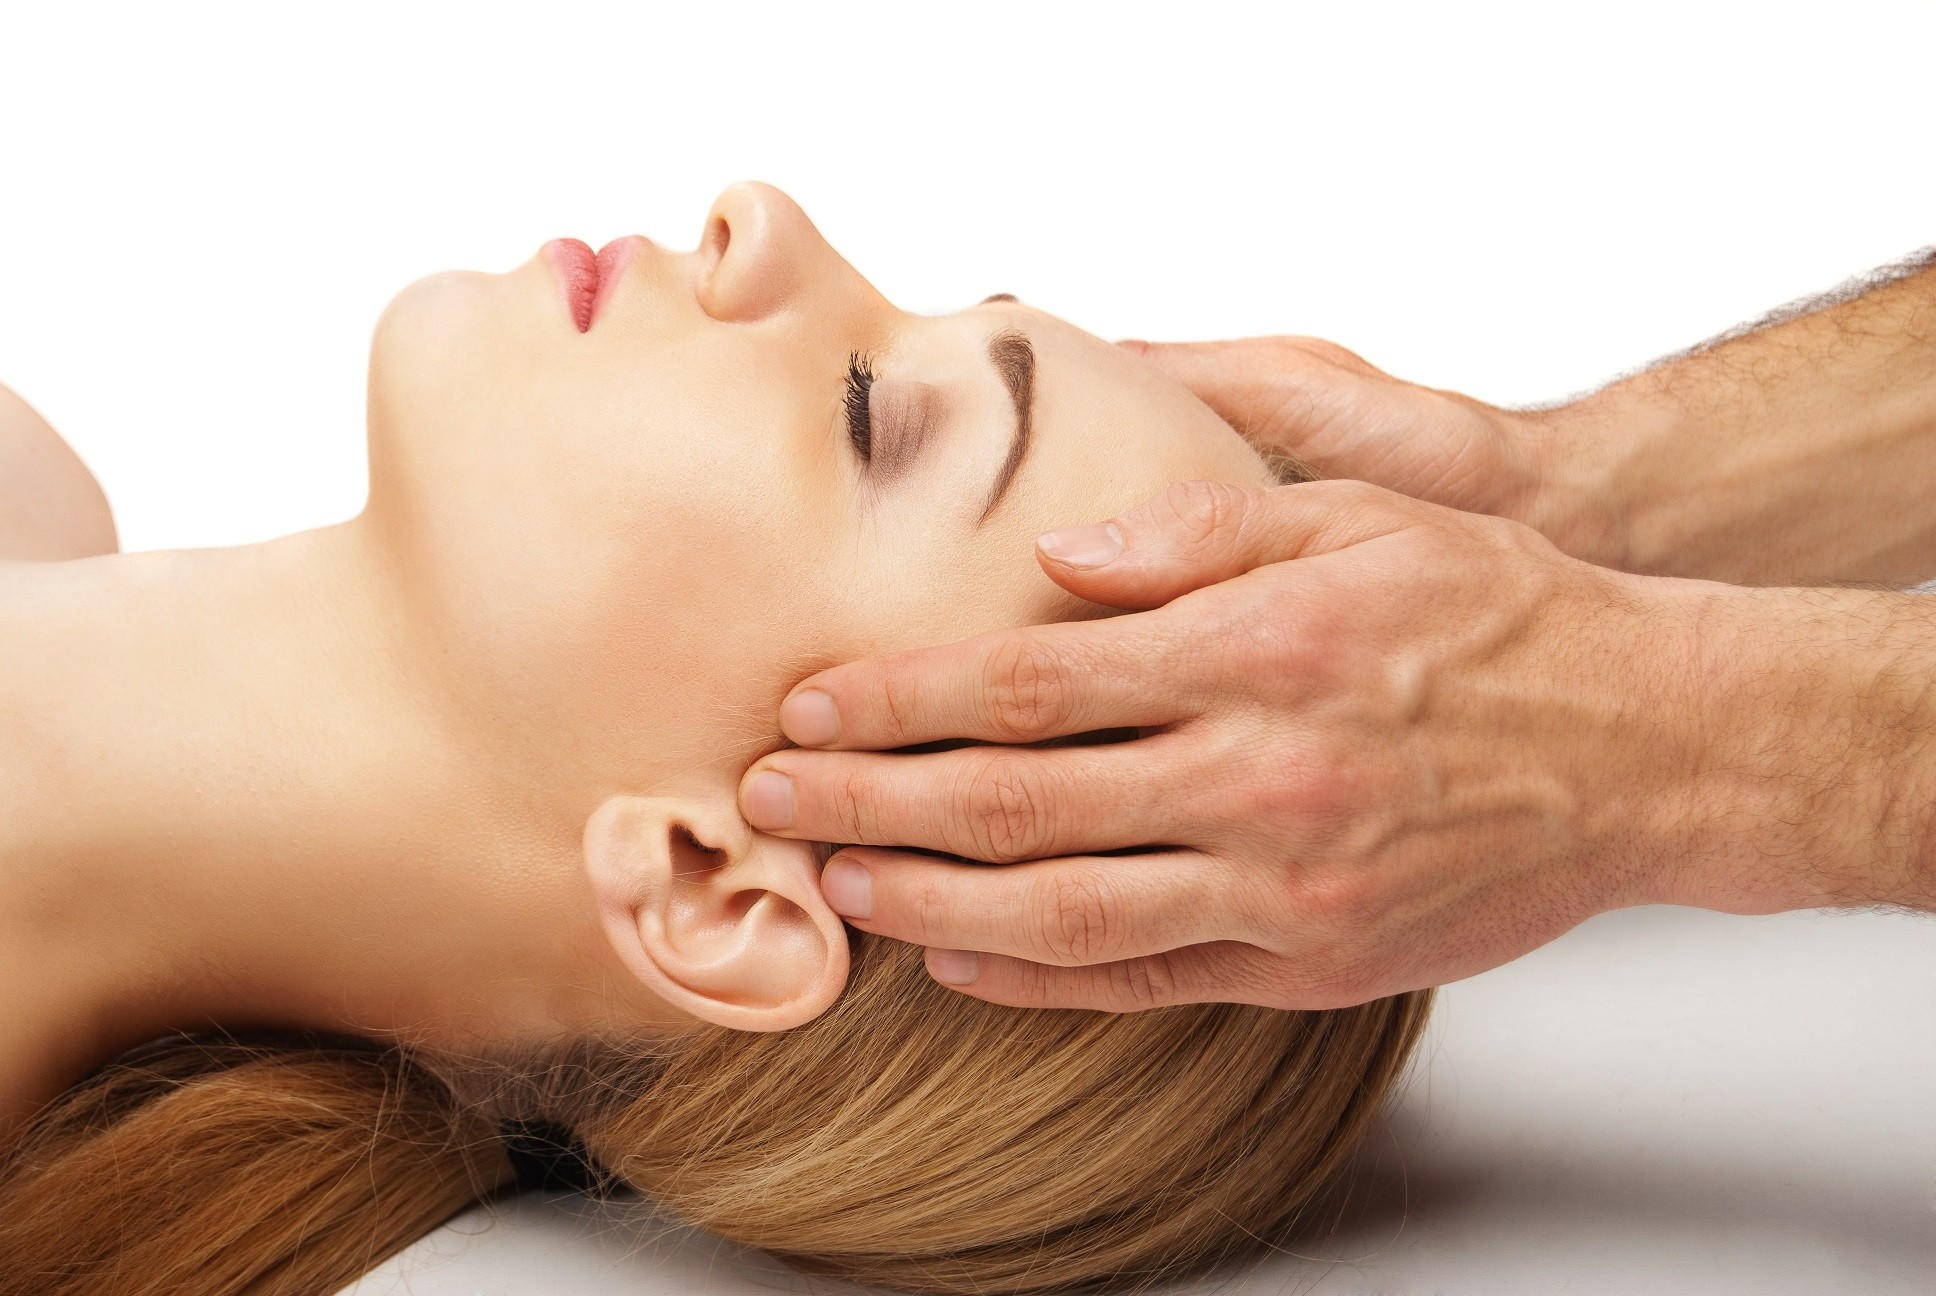 Frau bei manueller Kiefergelenk-Therapie